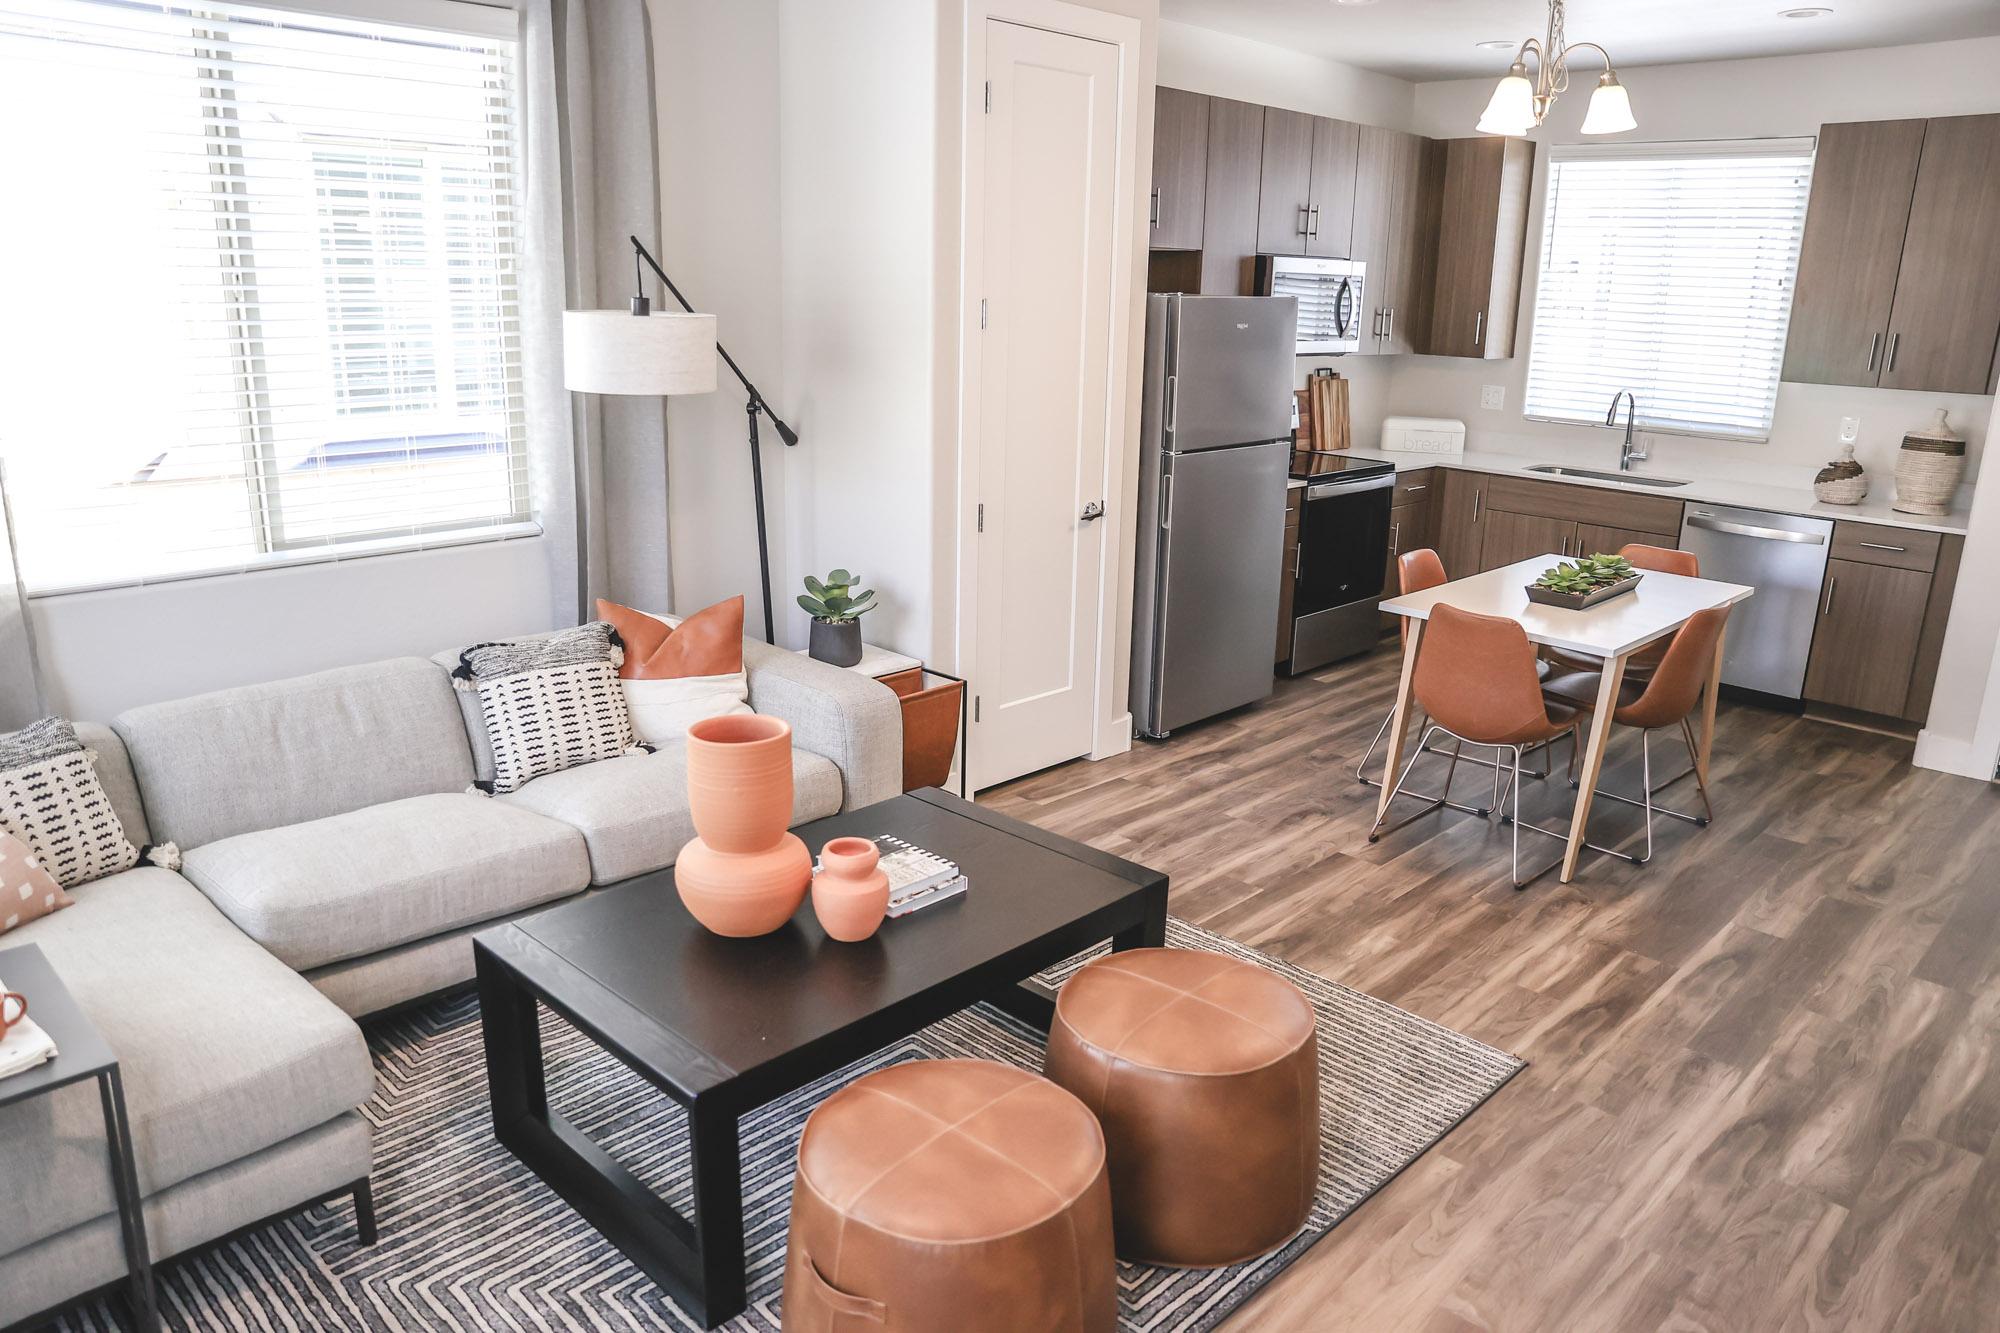 Open Floor Plans at Village at Harvard Crossing Apartments in Goodyear, AZ